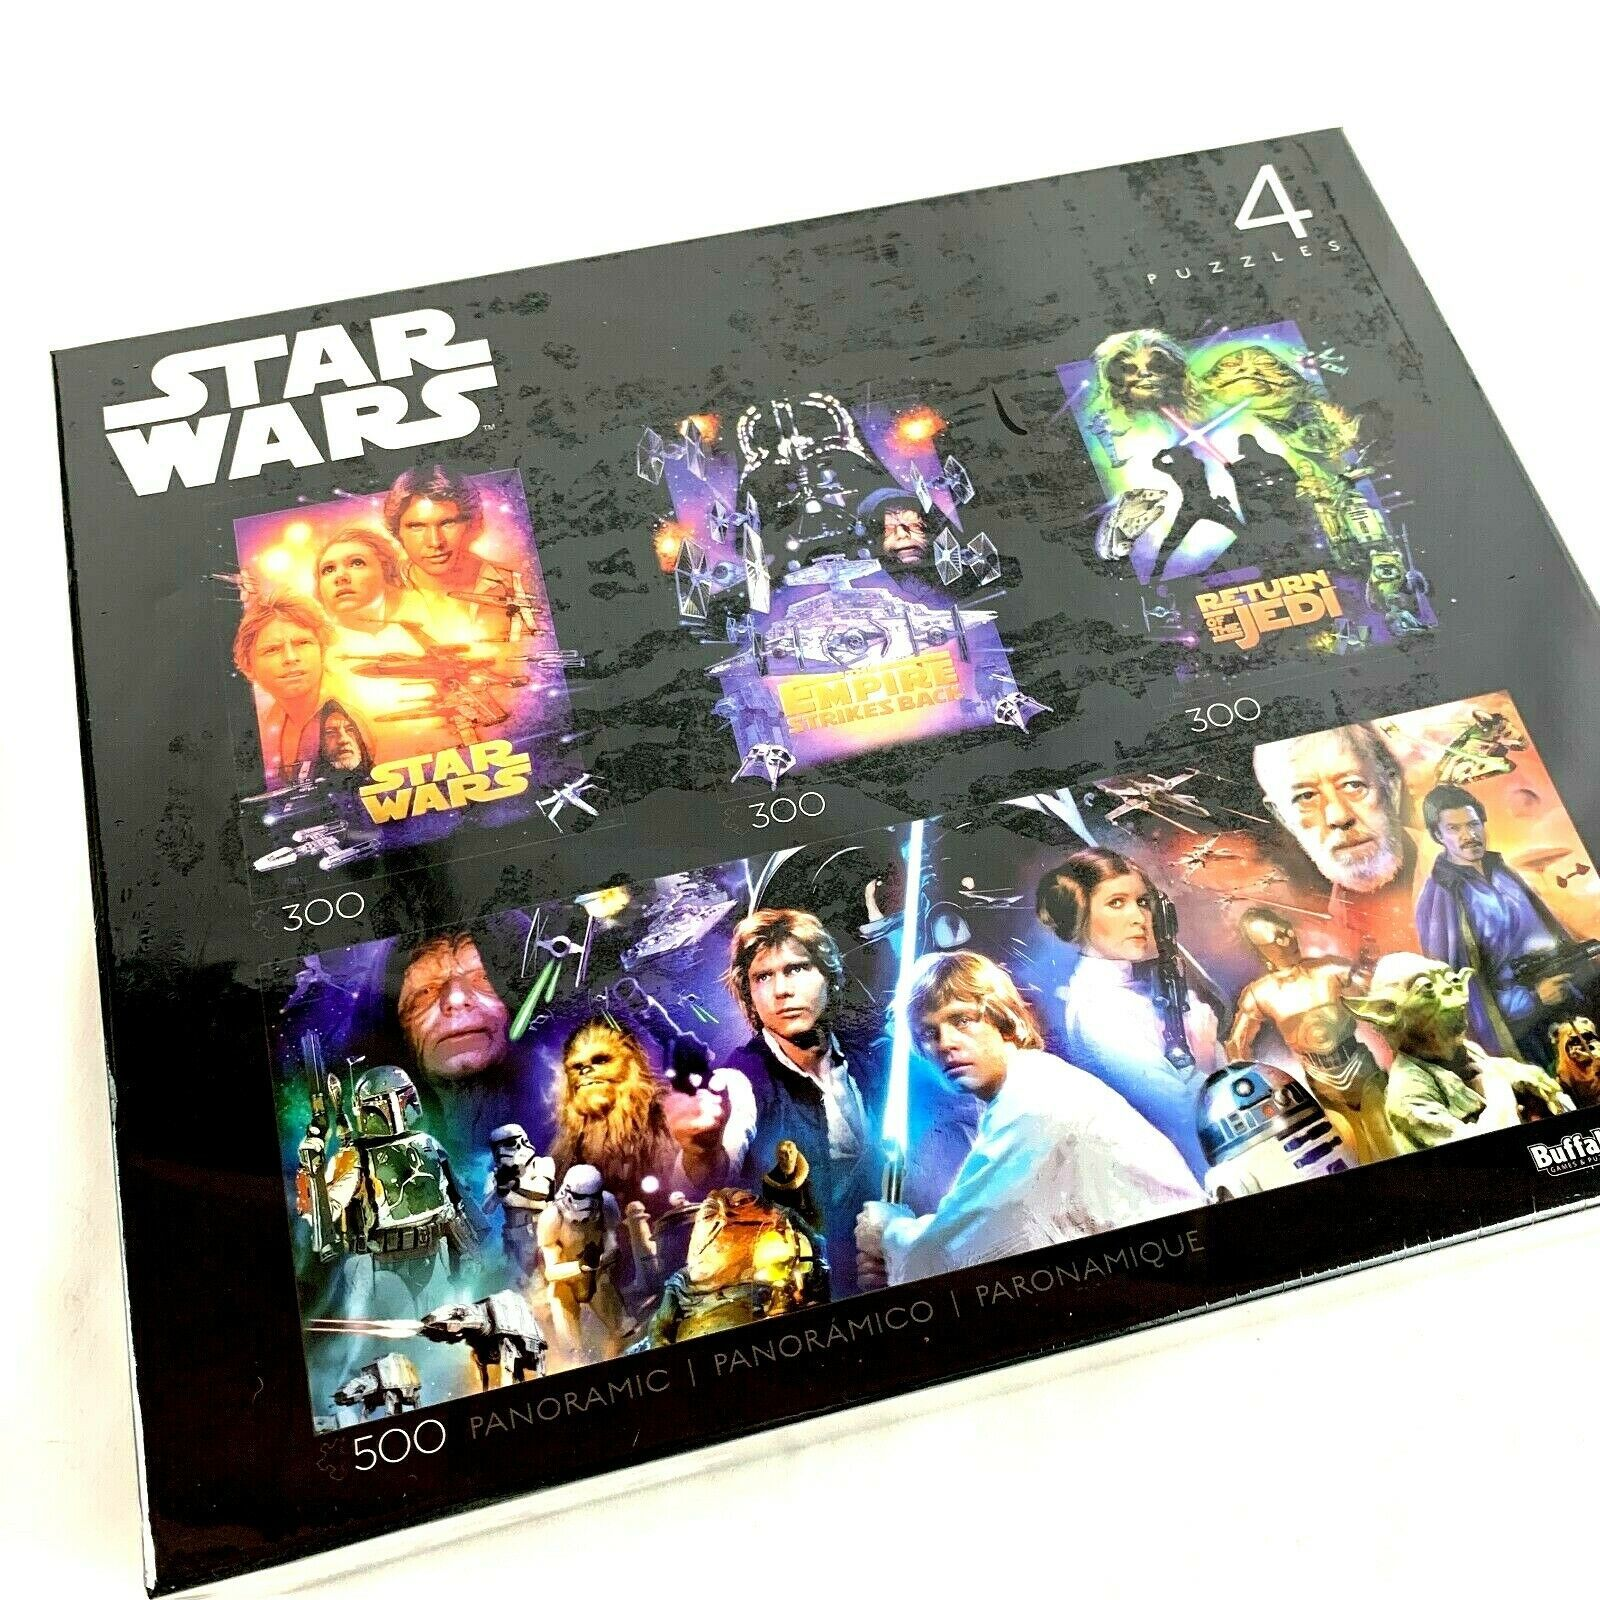 Star Wars Original Trilogy Jigsaw Puzzle 4 Pack 300 500 pcs Disney Buffalo 30620 - $46.44